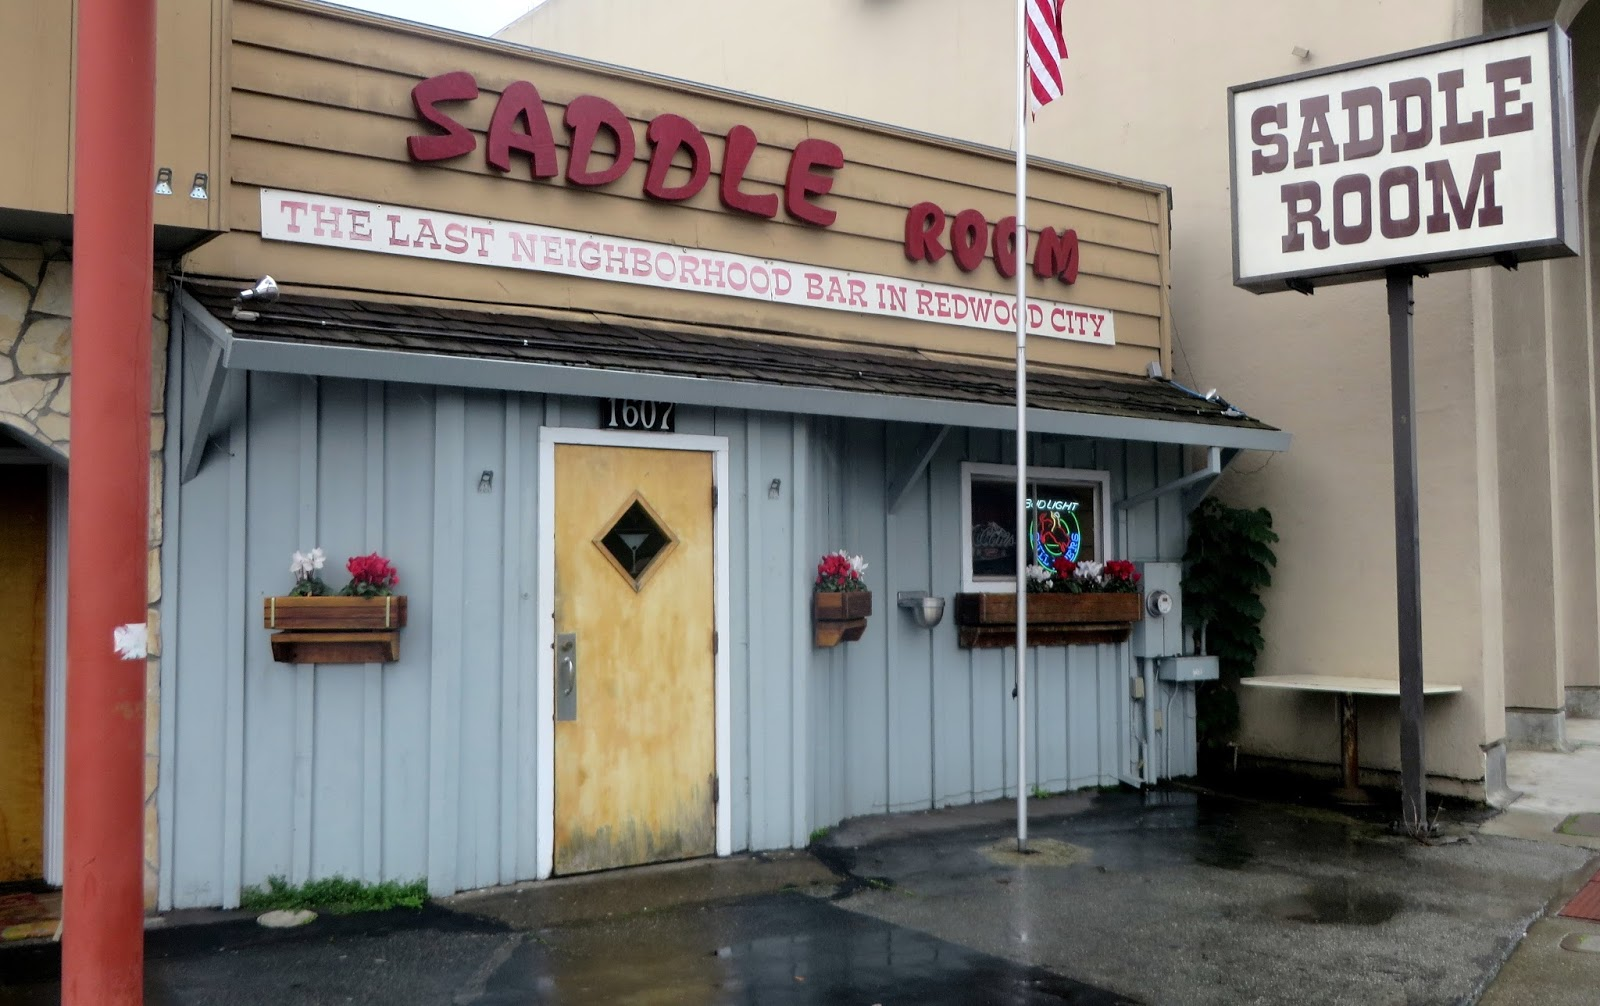 Seattlebars.org: #2421 - The Saddle Room, Redwood City, CA - 2/28/2014